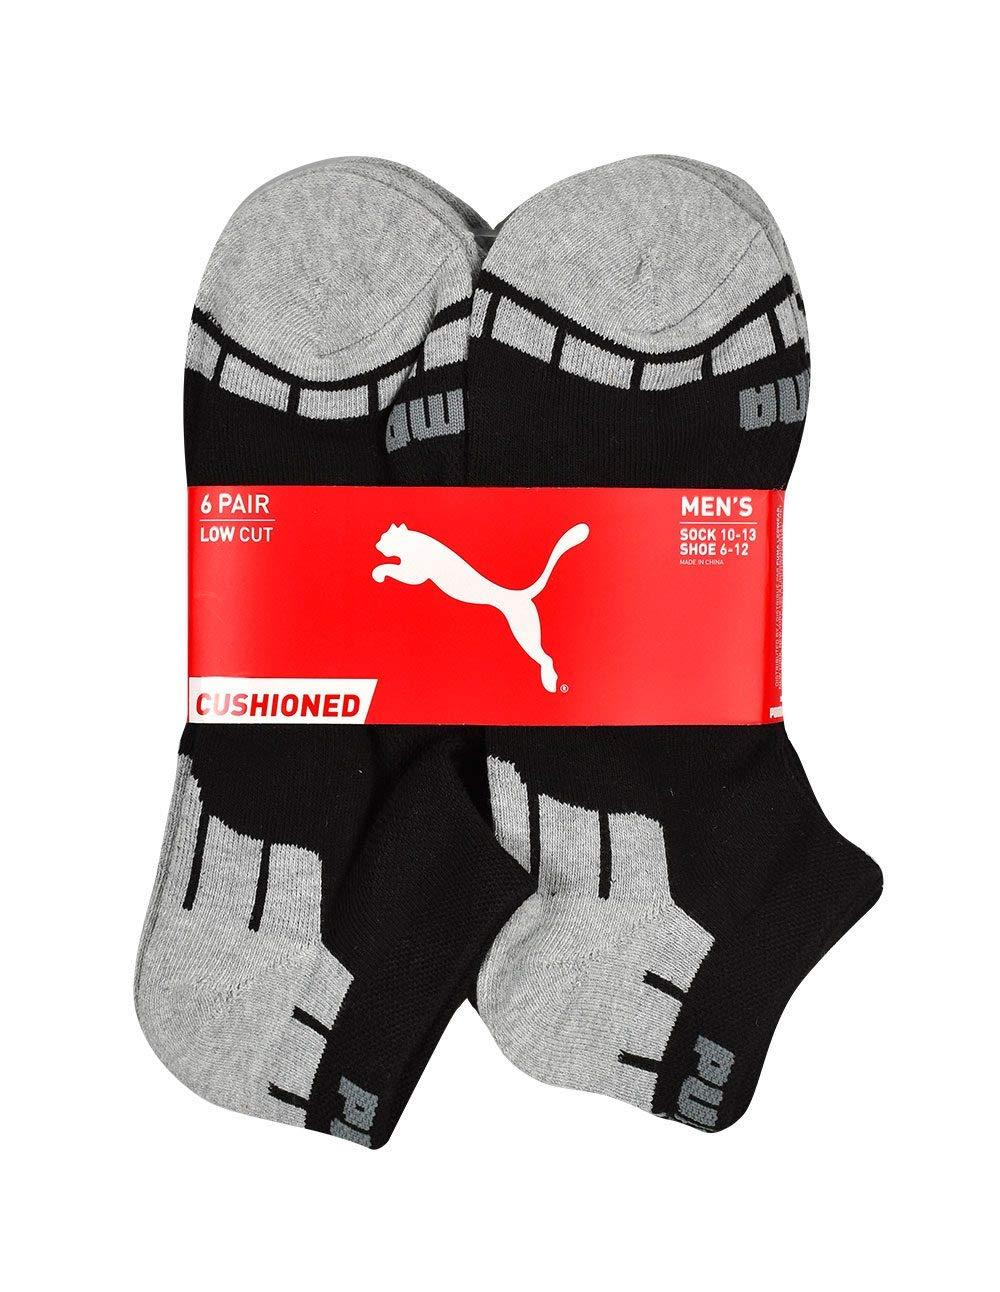 PUMA Men's P112479 Low-Cut 6-Pack Socks, Black/Silver Sock 10-13 Shoe Size 6-12 by PUMA